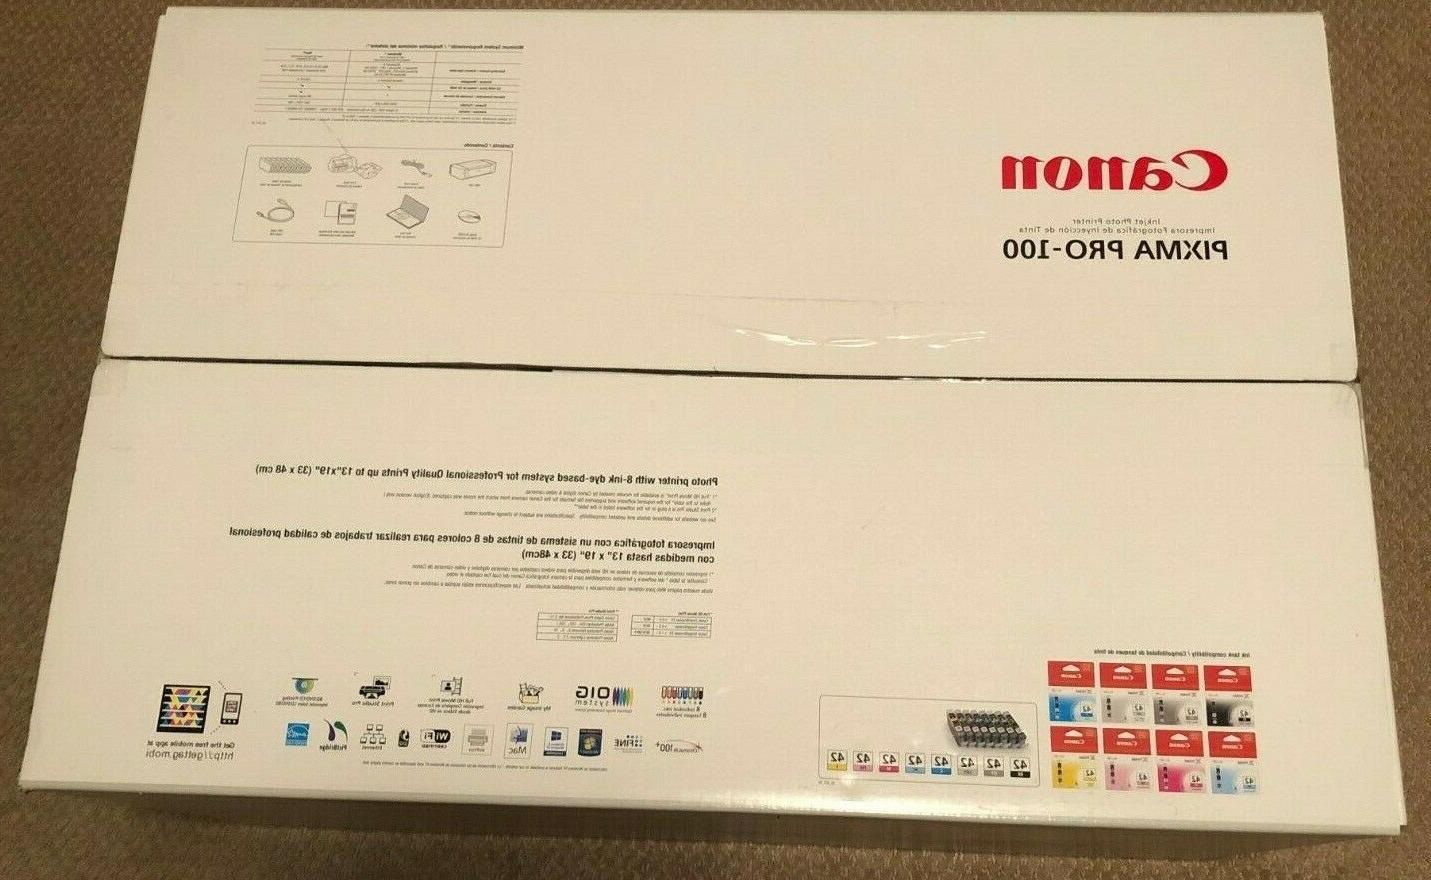 pixma pro 100 digital photo inkjet printer